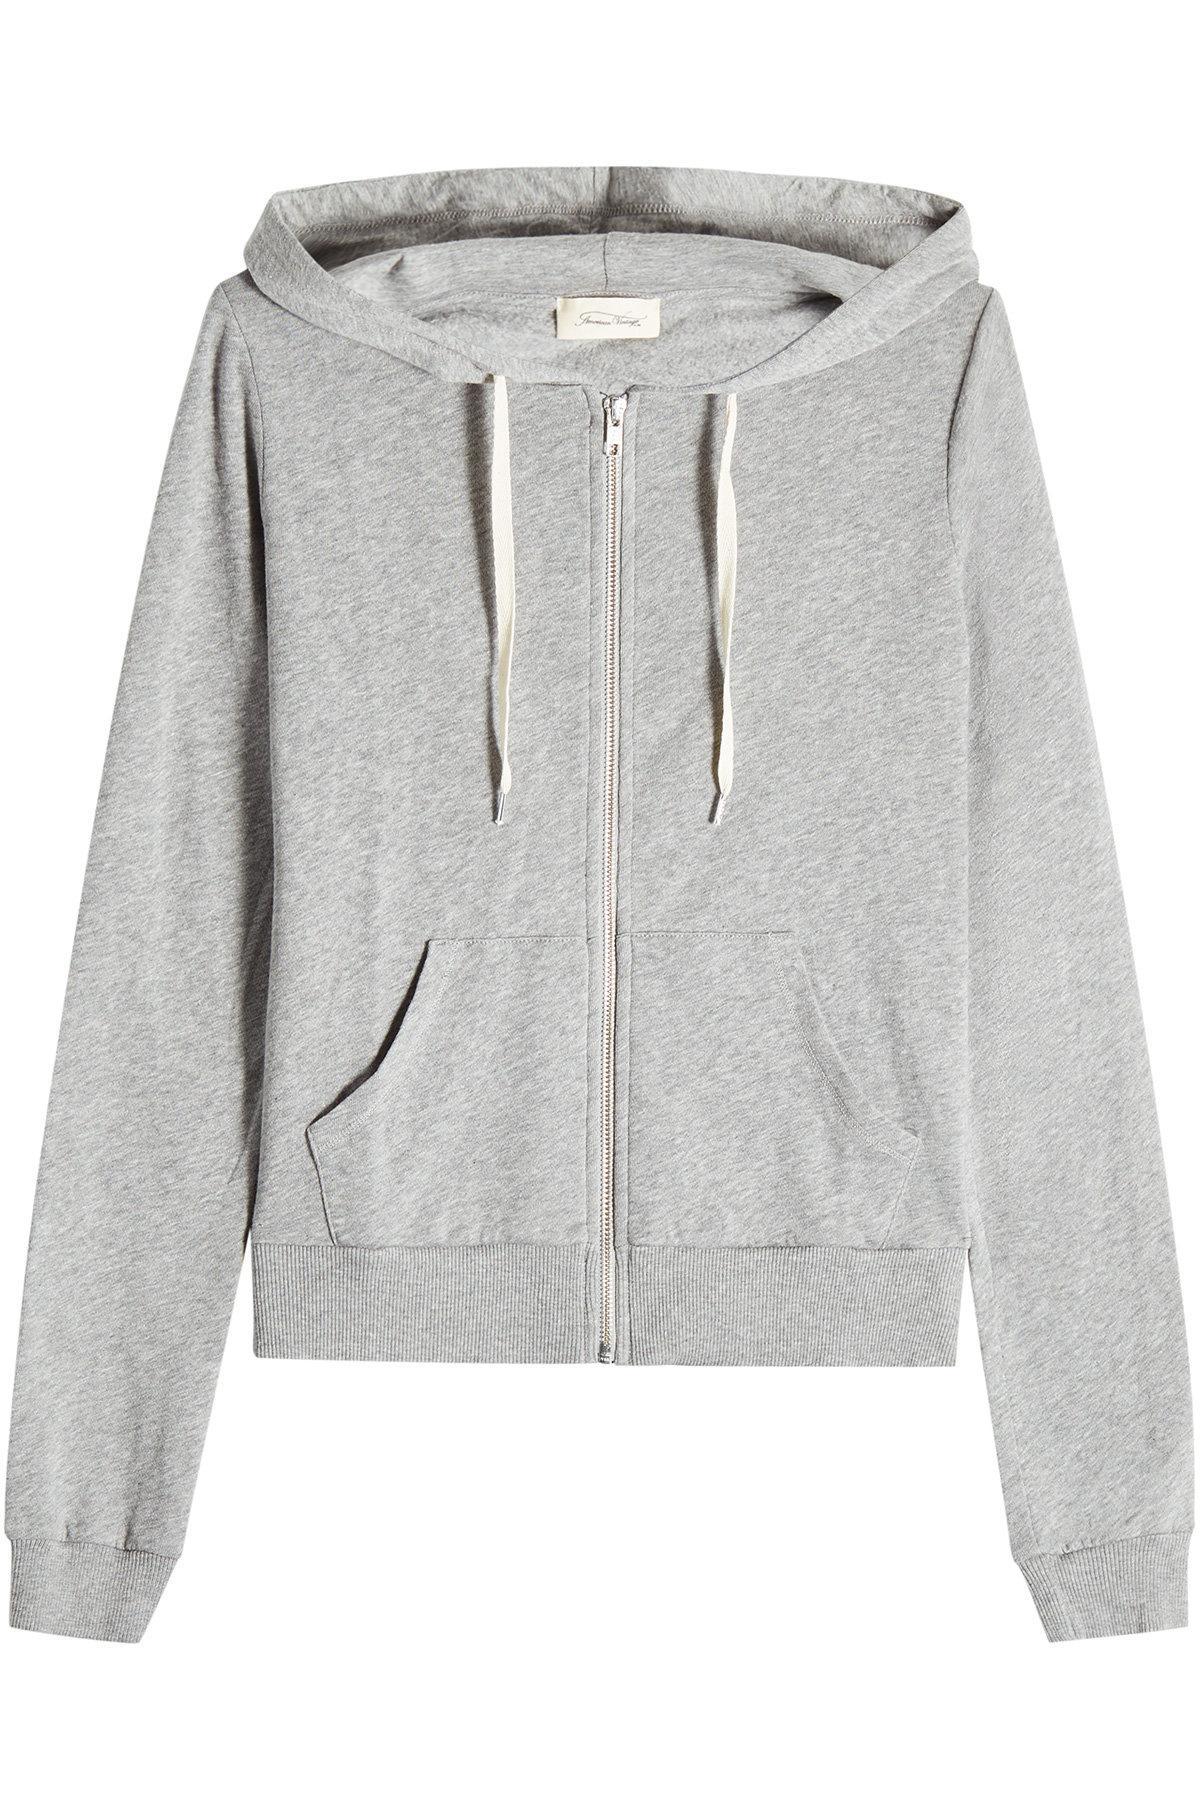 American Vintage Zipped Cotton Hoody In Grey